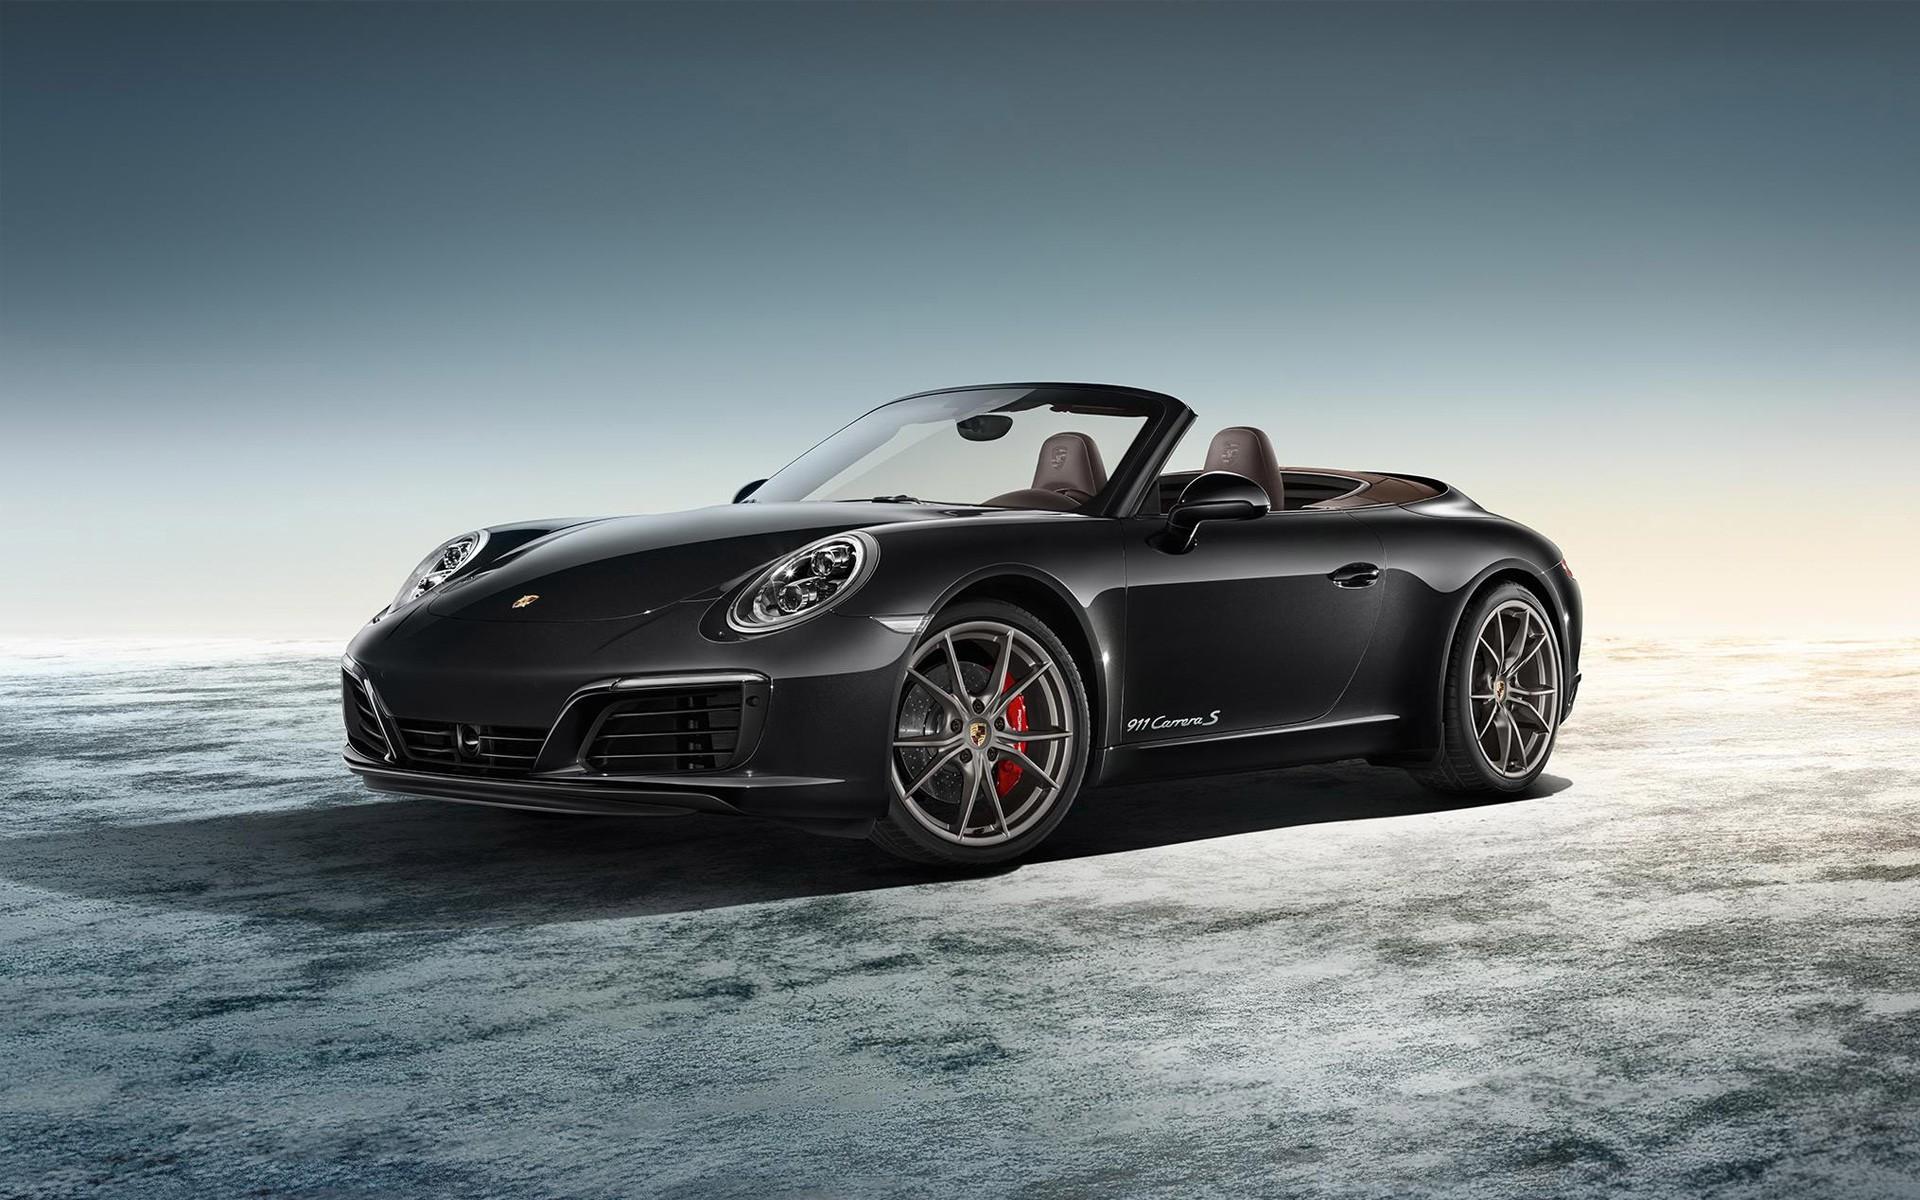 4k Uhd Wallpapers Of Cars Porsche Exclusive 911 Carrera S Cabriolet 2016 Wallpapers